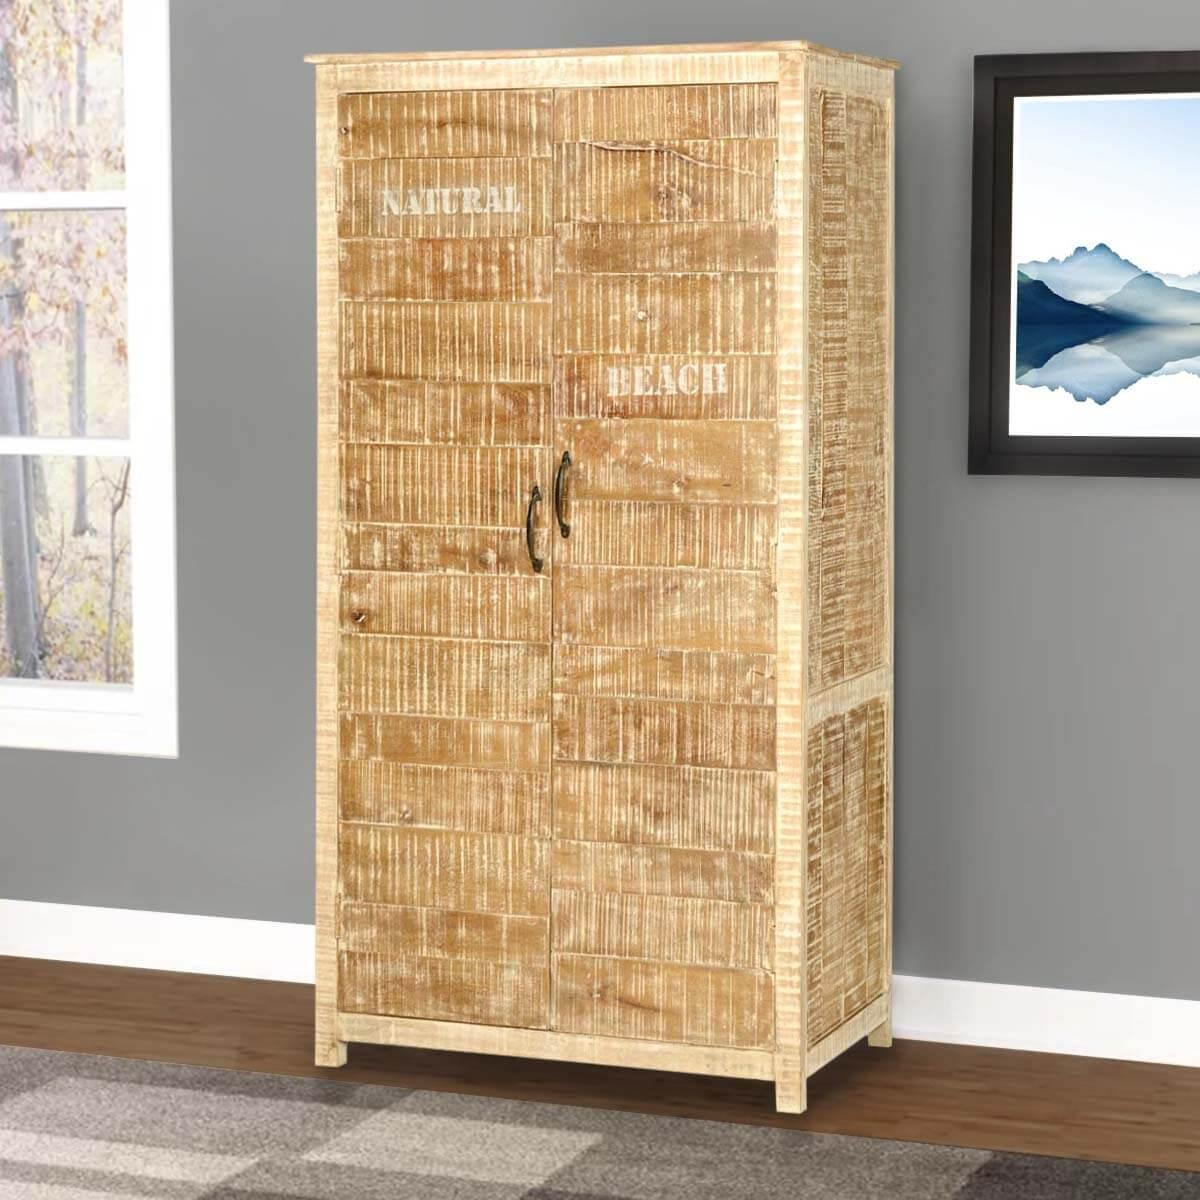 New orleans rustic solid wood bedroom armoire wardrobe